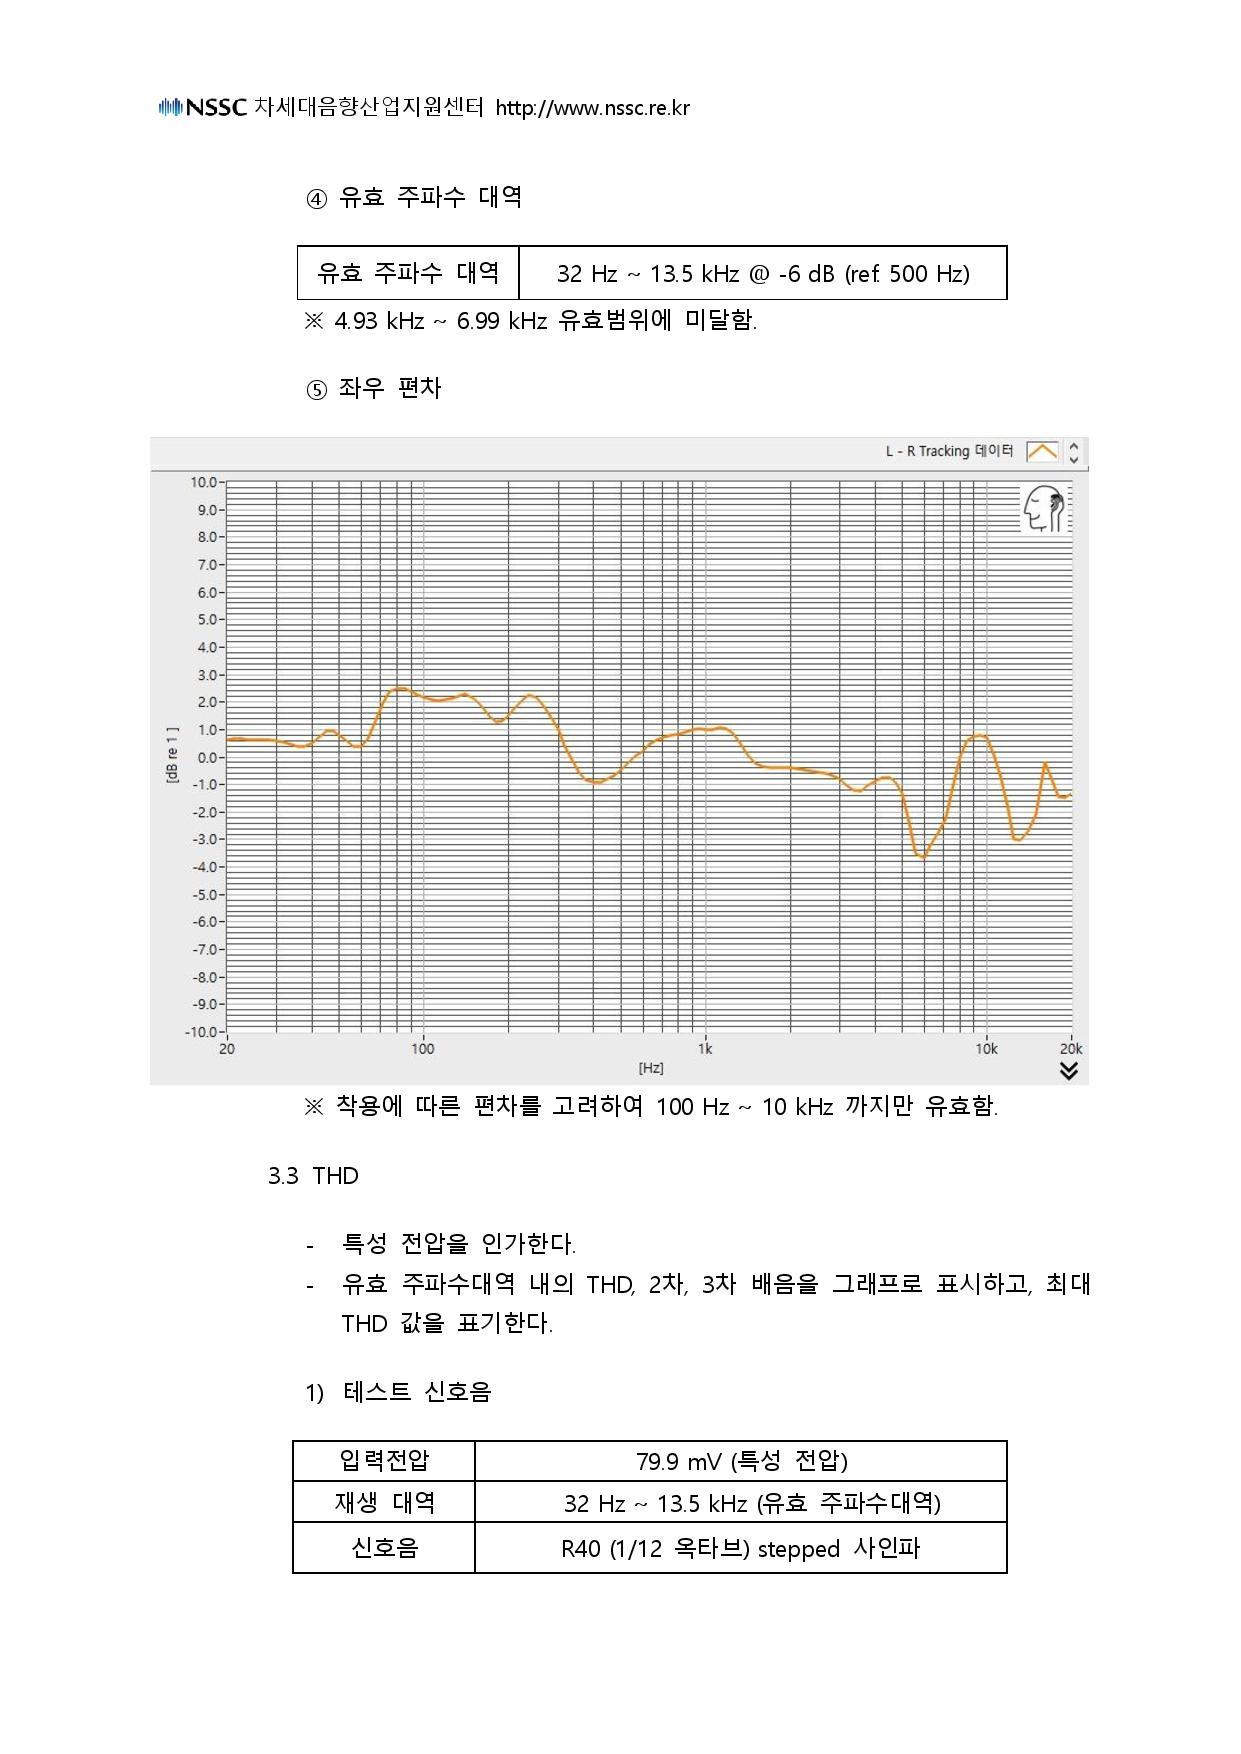 Audio-technica ATH-M50x-page-006.jpg